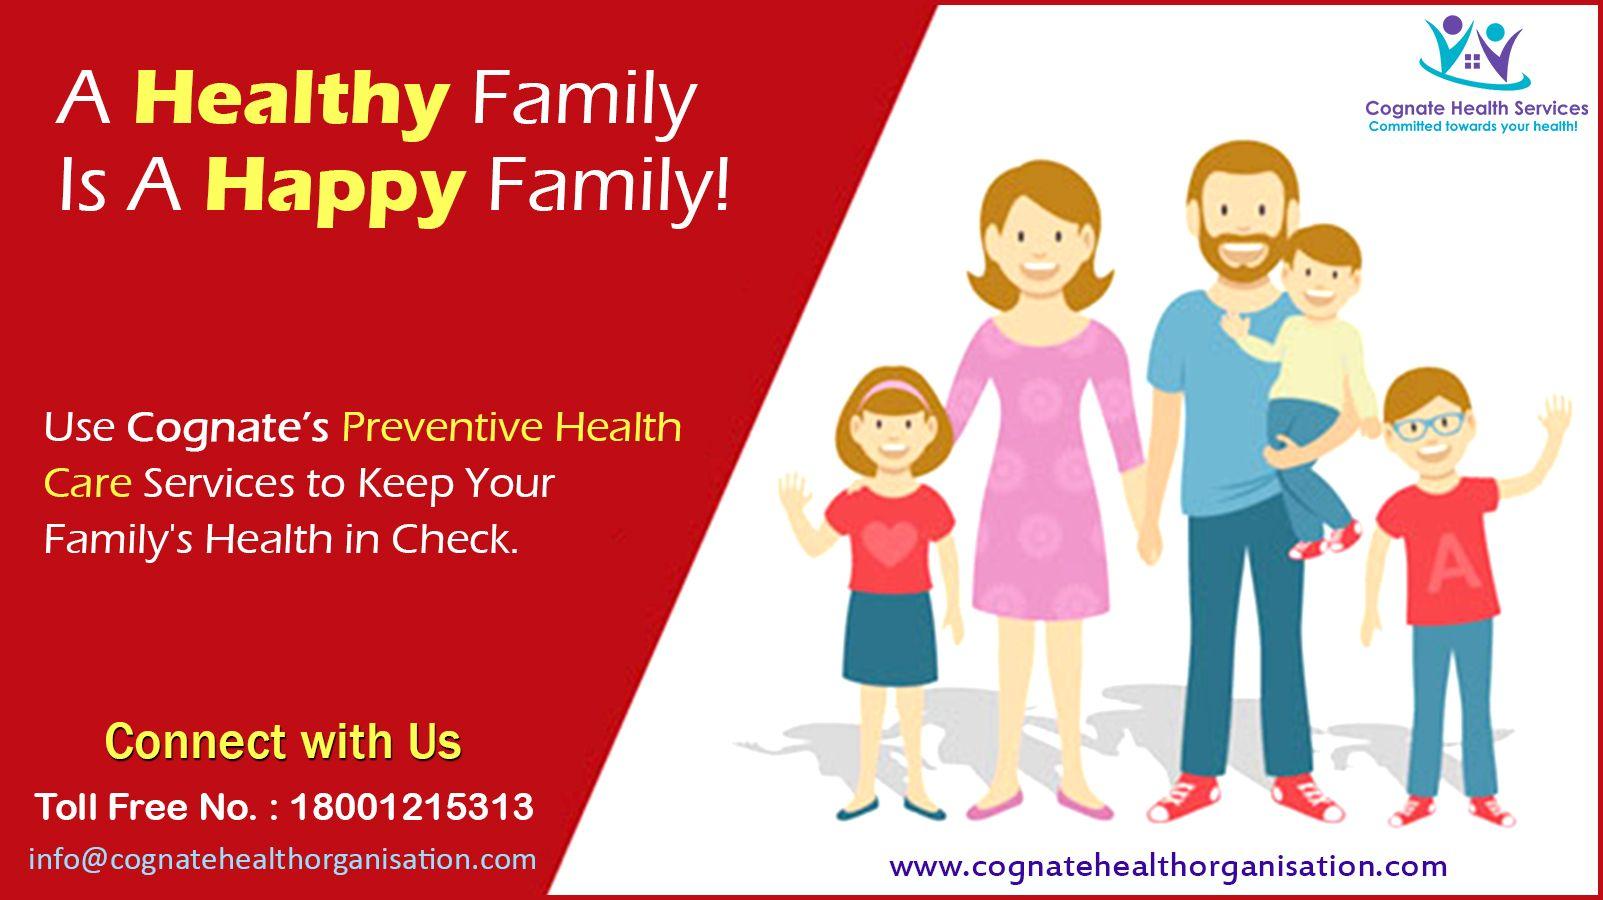 family health care south kalispell